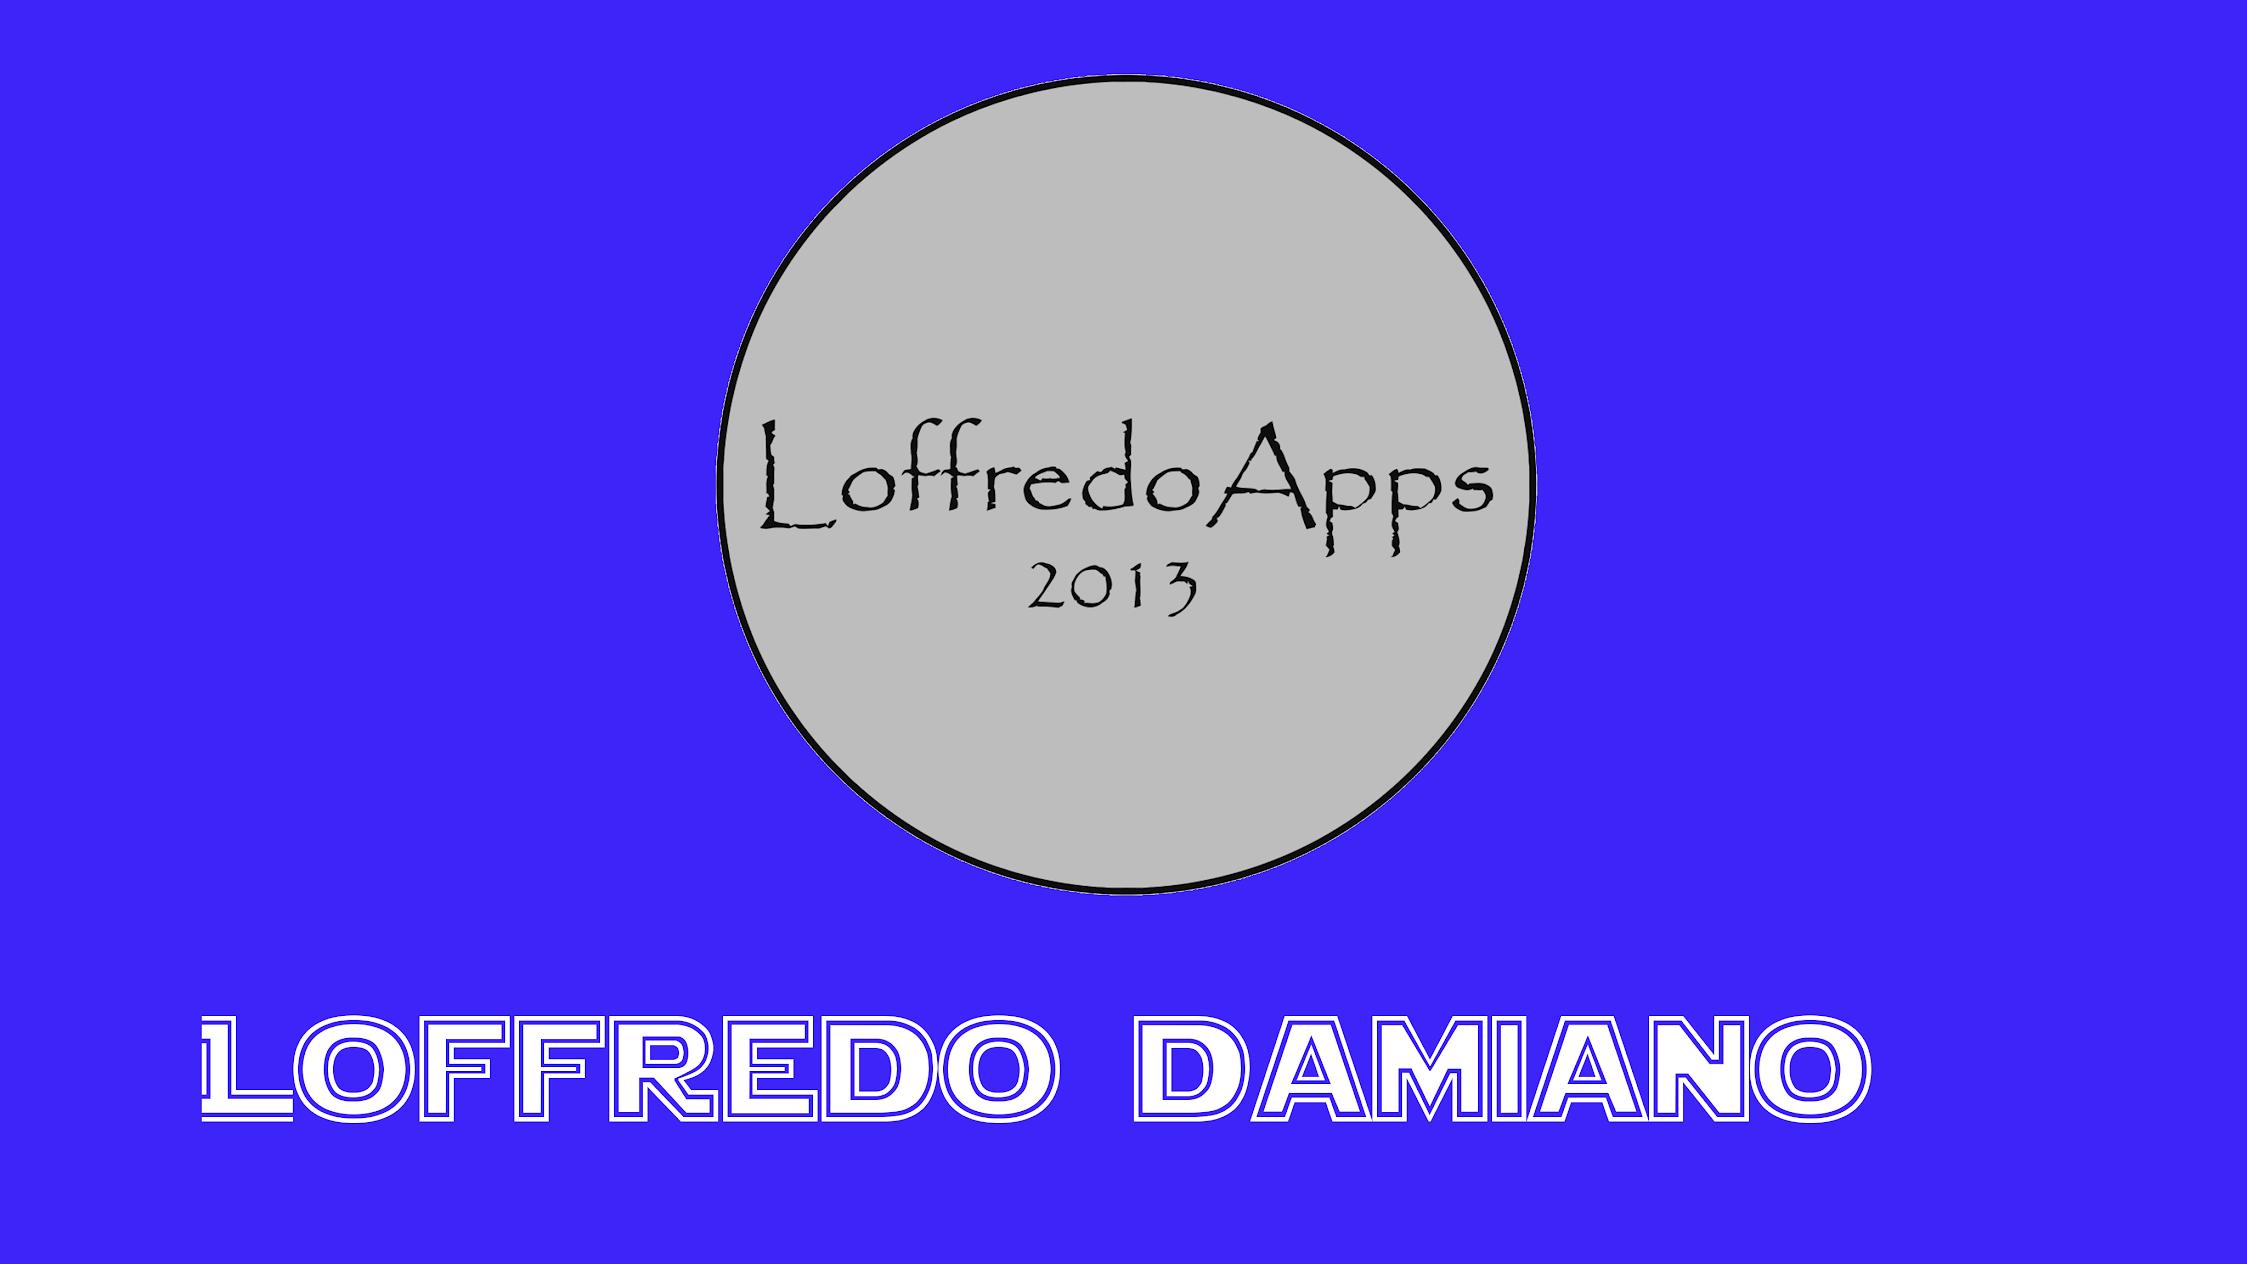 LoffredoApps